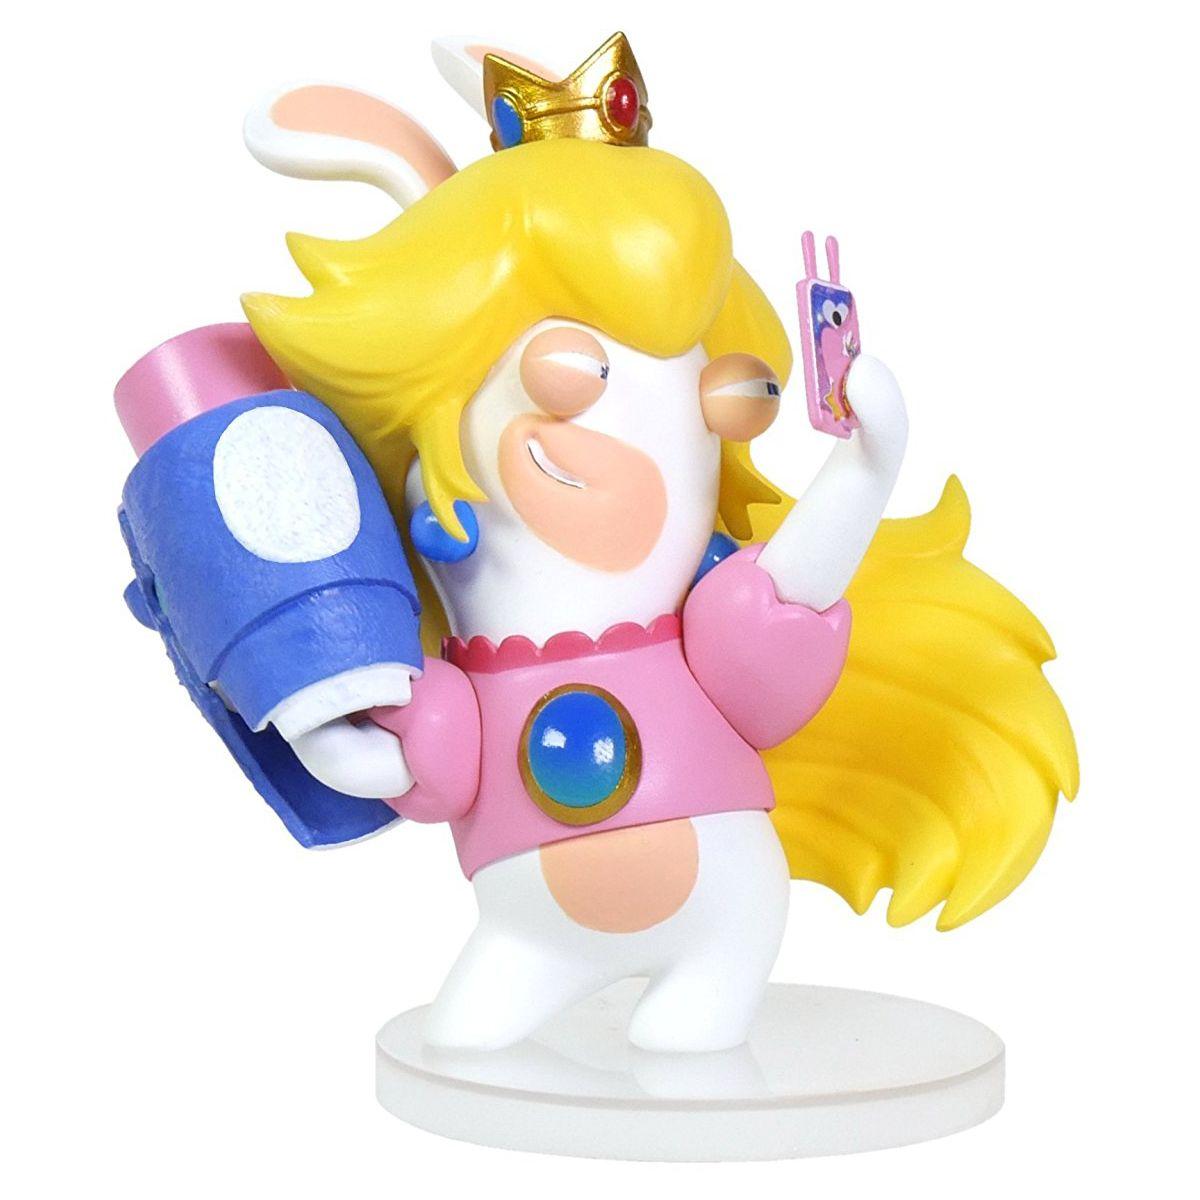 Figurine UBISOFT Mario + Lapins Crétins - Peach 8cm (photo)